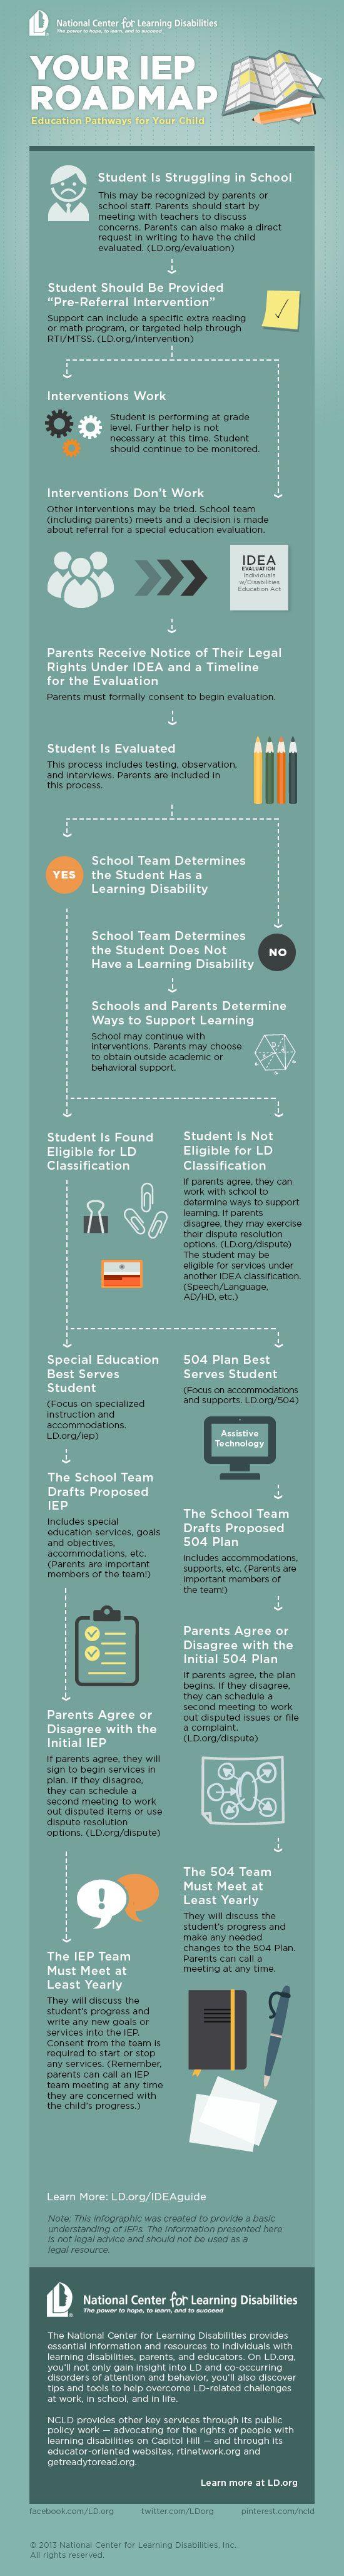 iep-roadmap-infographic